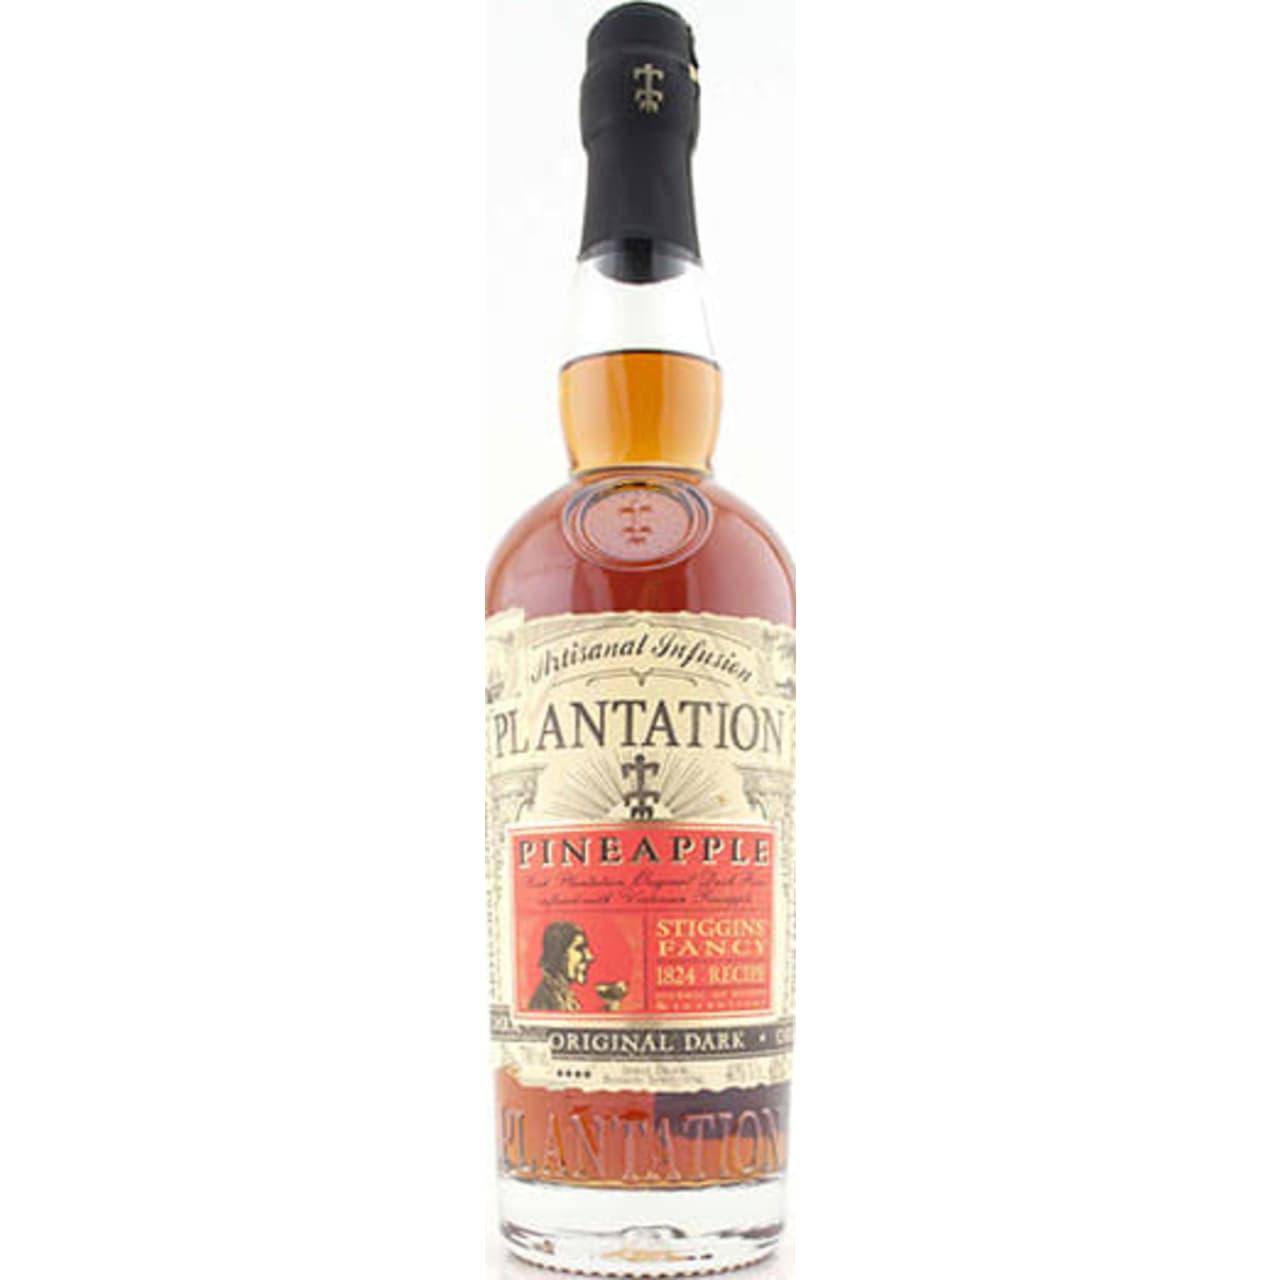 Product Image - Plantation Pineapple Stiggins Fancy Rum